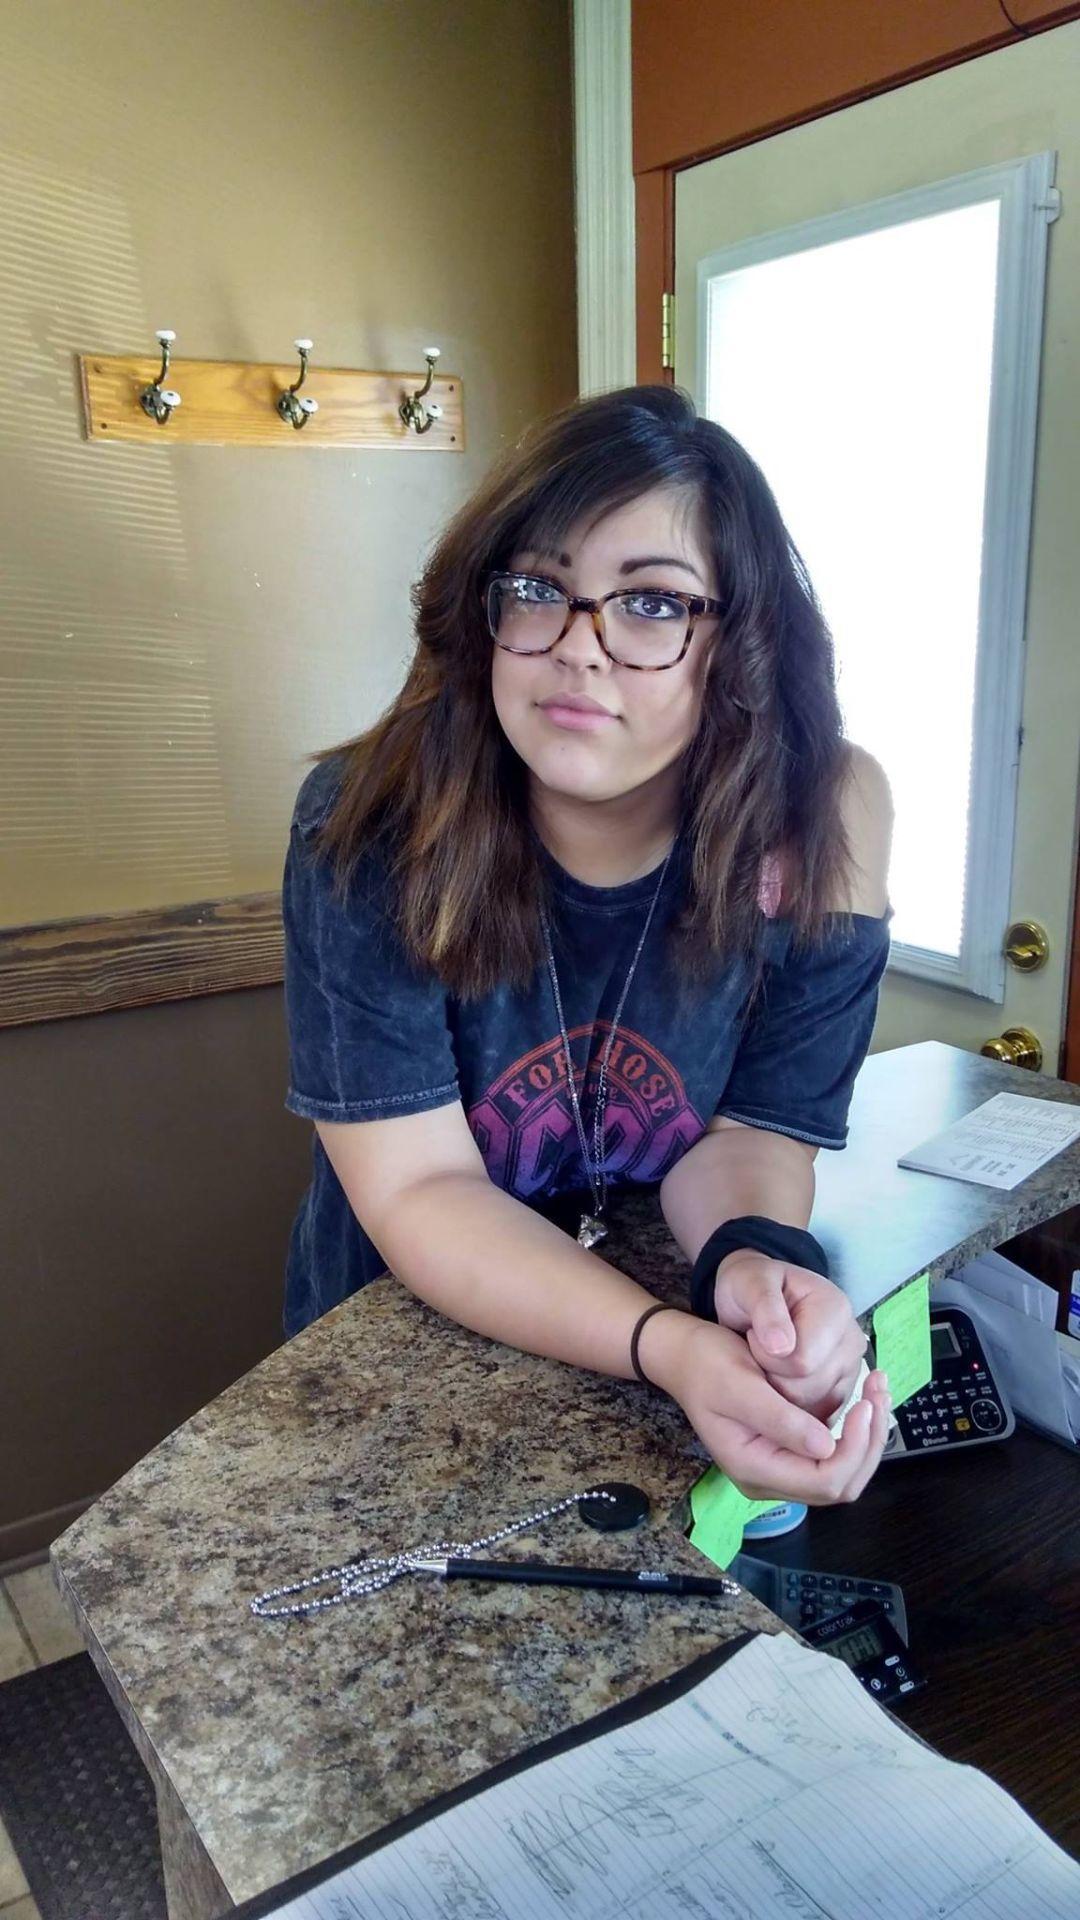 Missing: 14-year-old Dorchester Girl Last Seen On Thursday